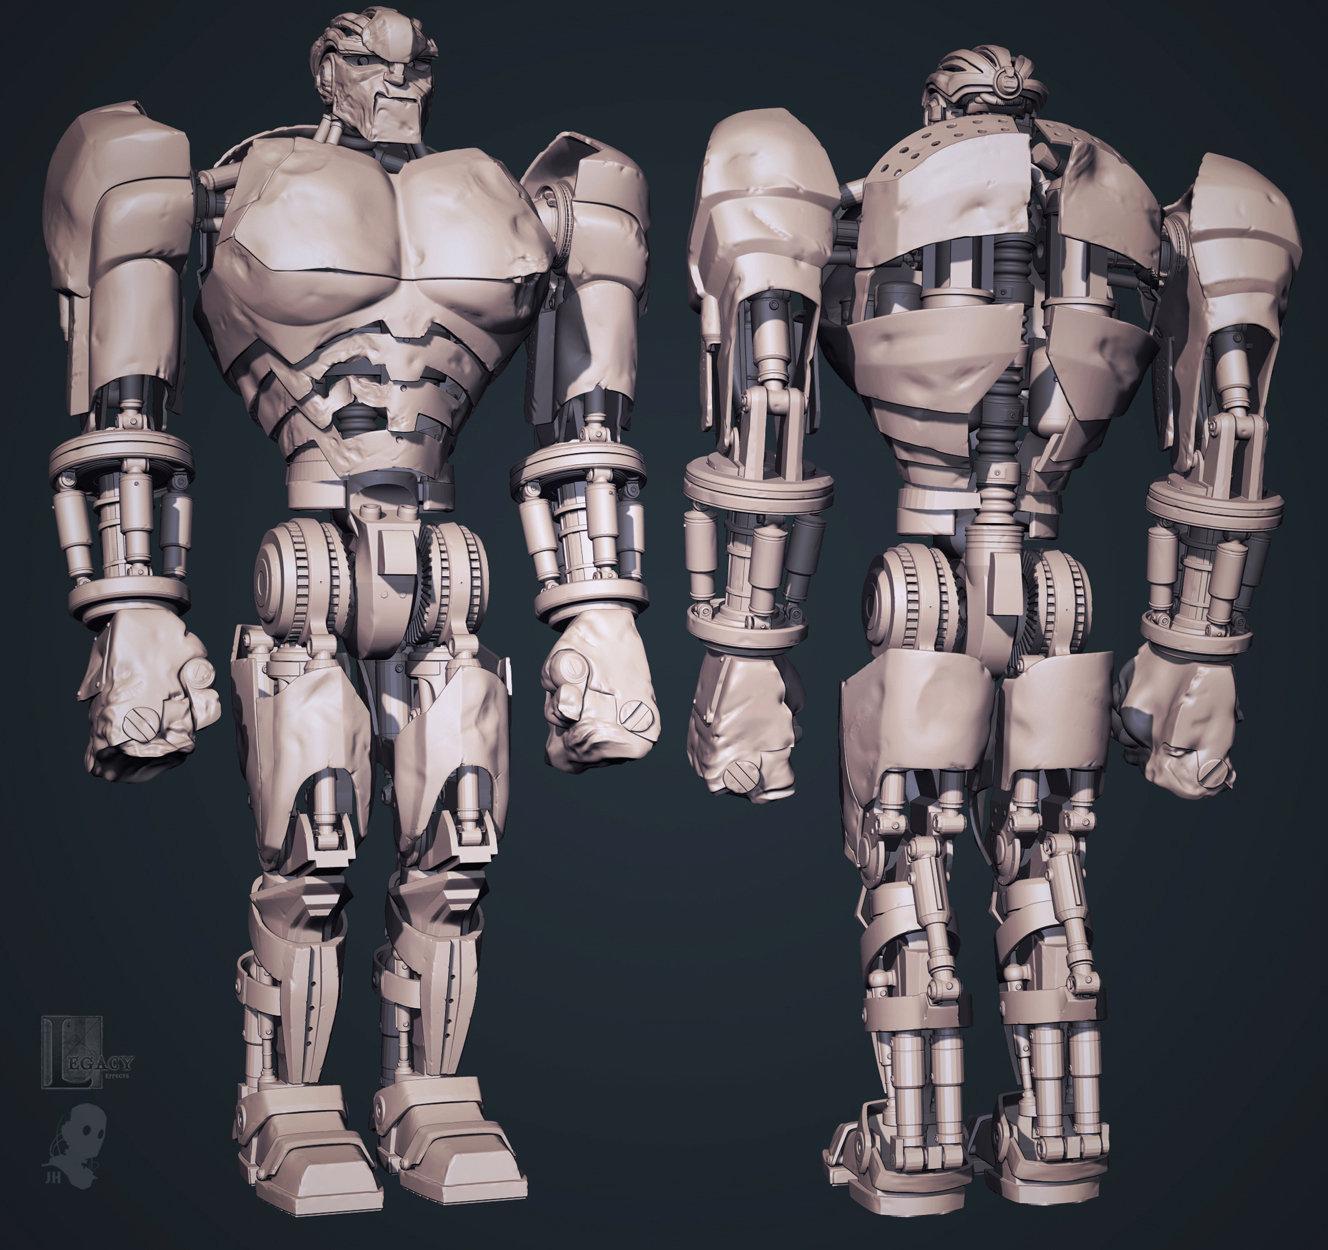 Droidsforsale real steel ambush